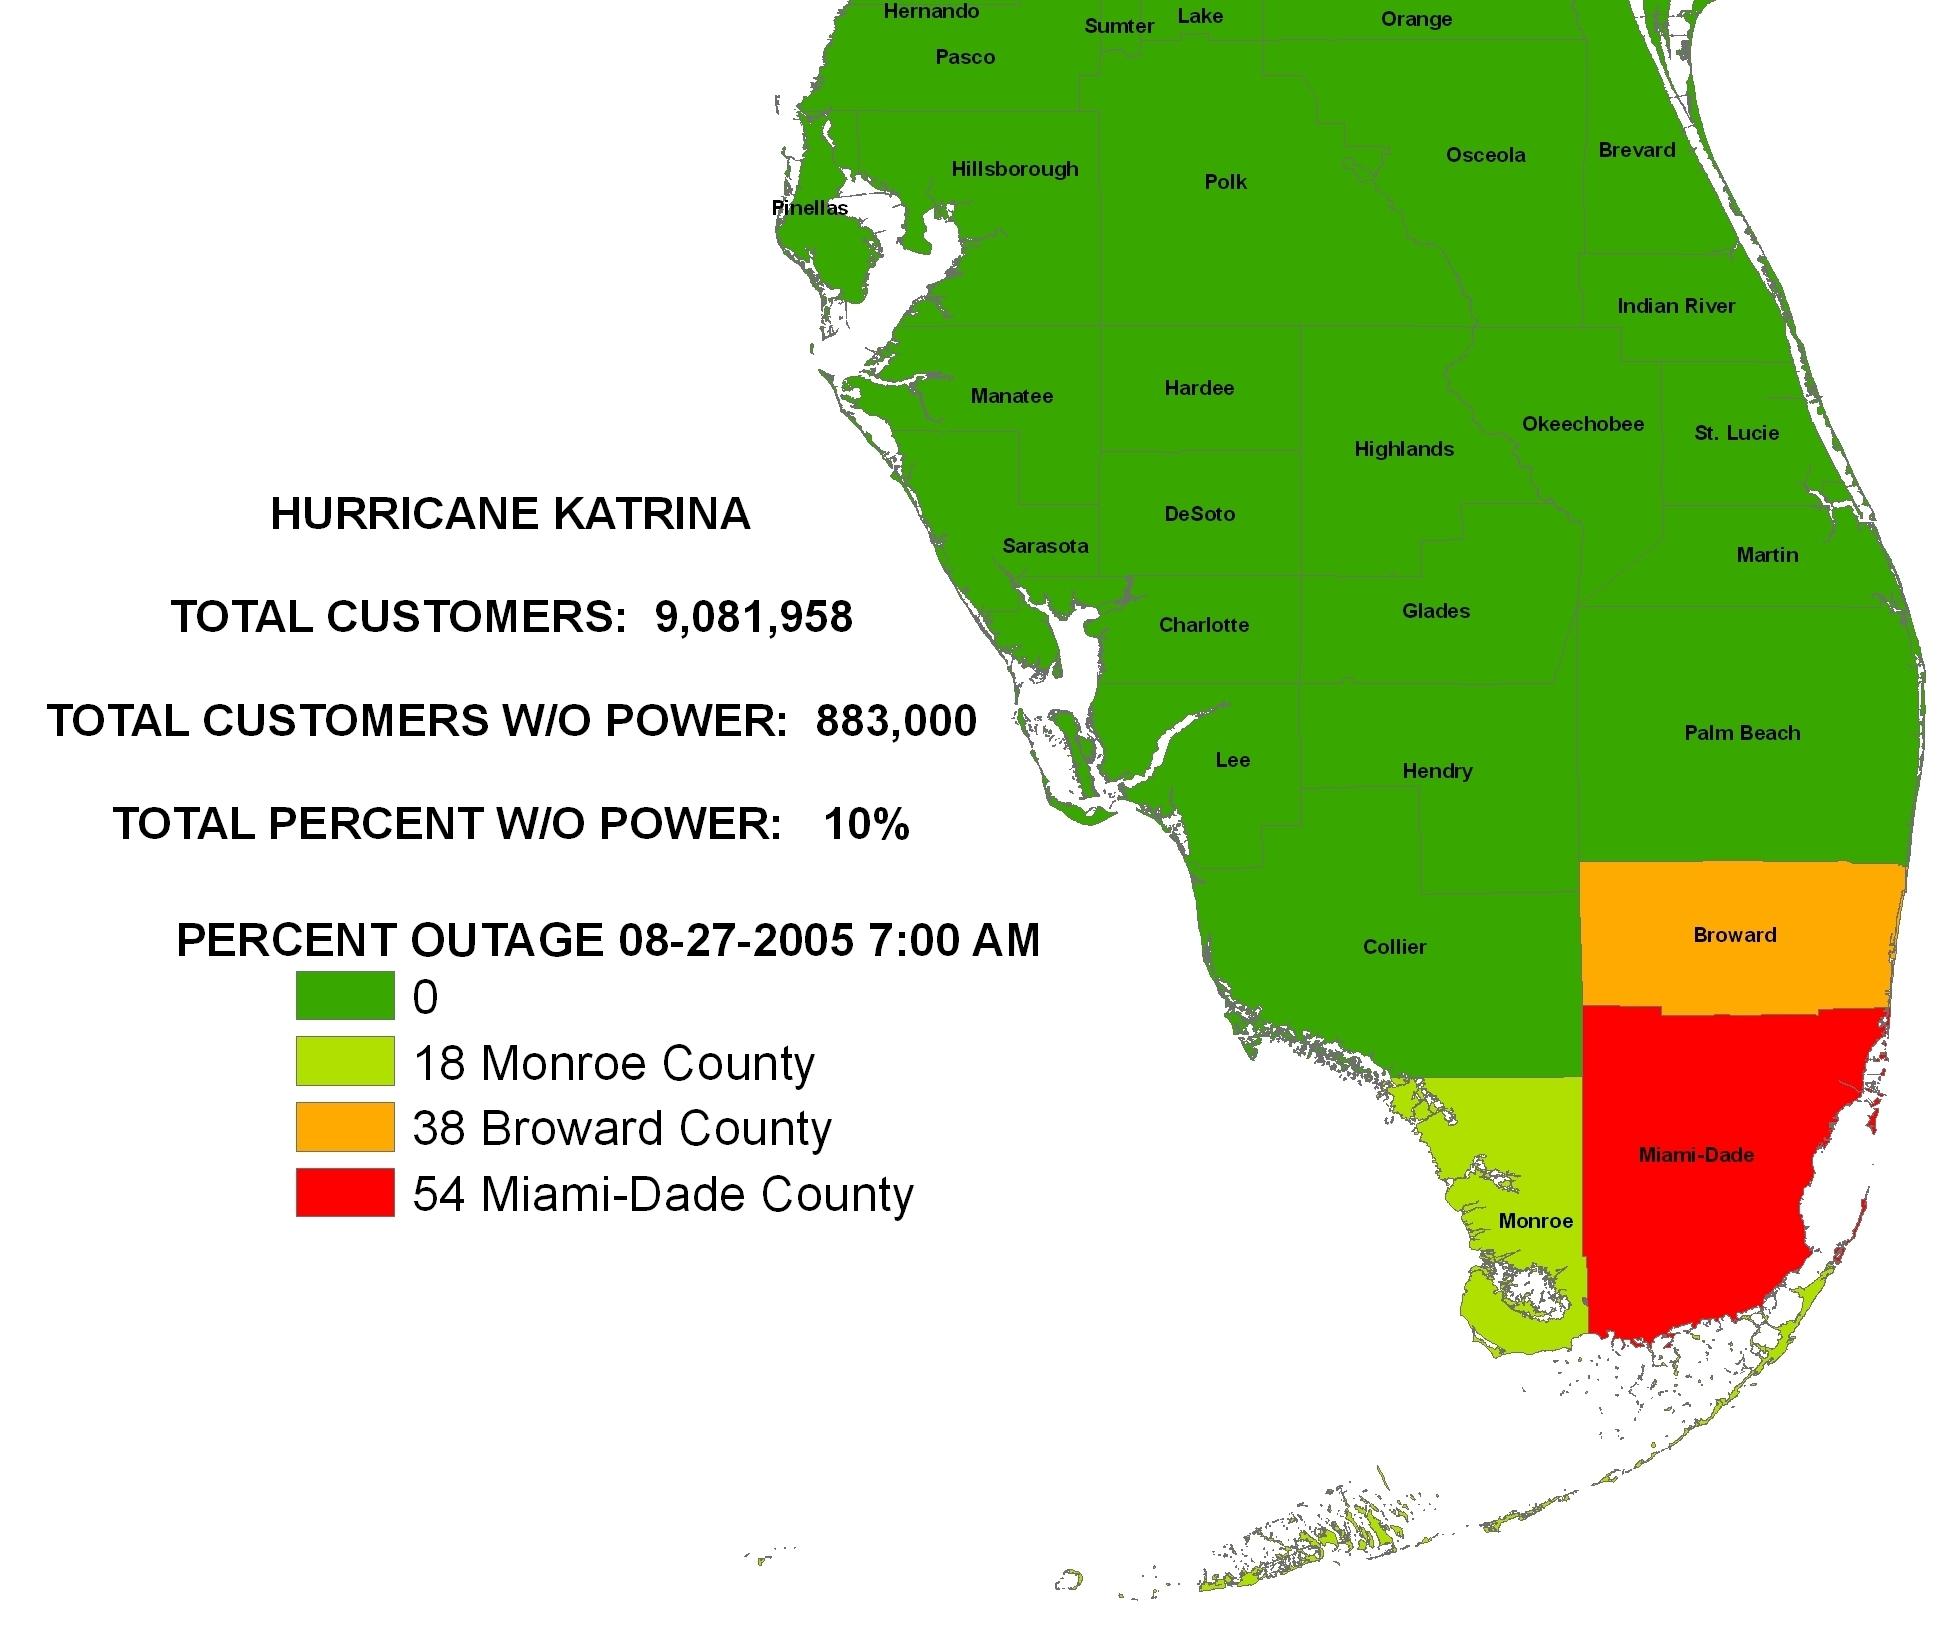 Iser - Hurricane Katrina pertaining to Map Of Area Affected By Hurricane Katrina